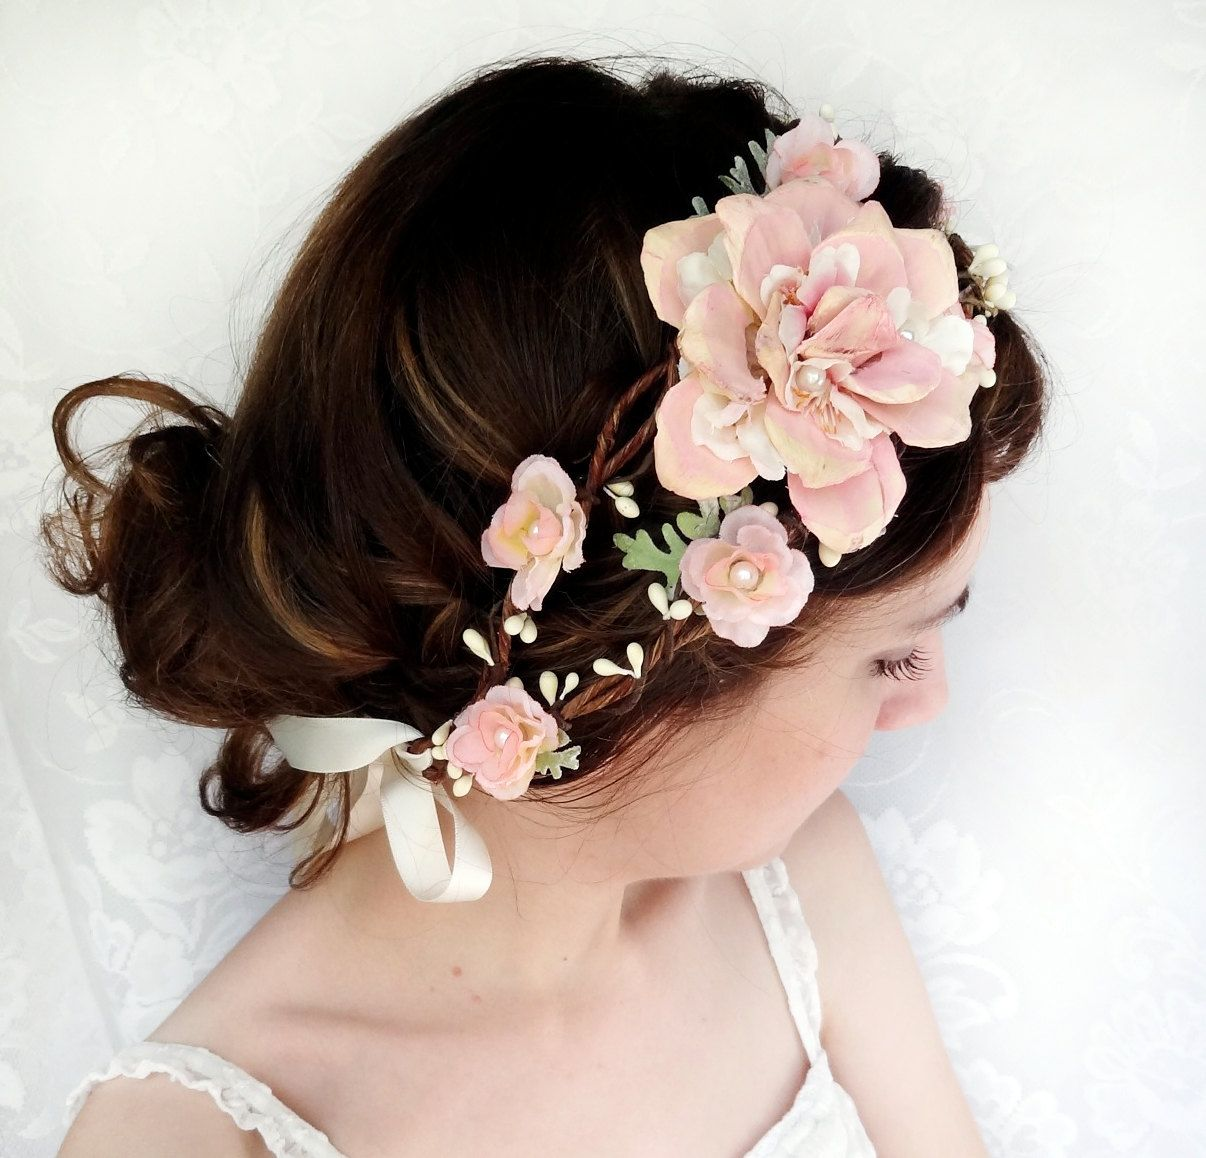 Romantic pink flower bridal headpiece flower crown wedding hair romantic pink flower bridal headpiece flower crown wedding hair wreath lambs ear izmirmasajfo